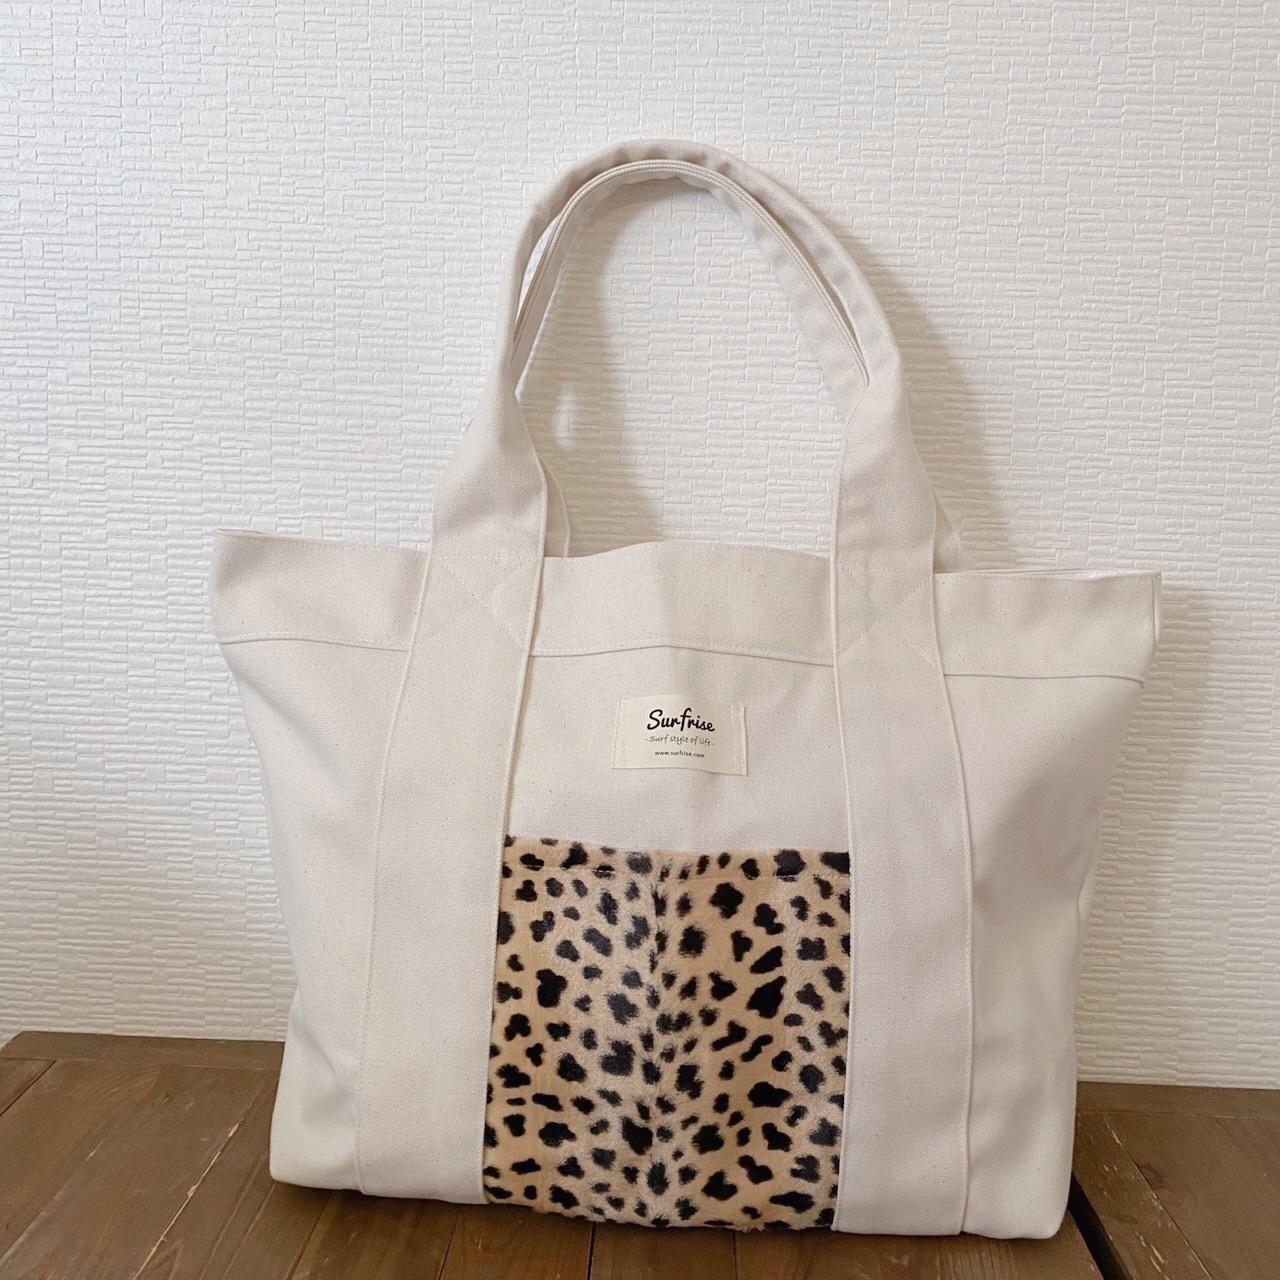 Tote bag L - White / Cheetah